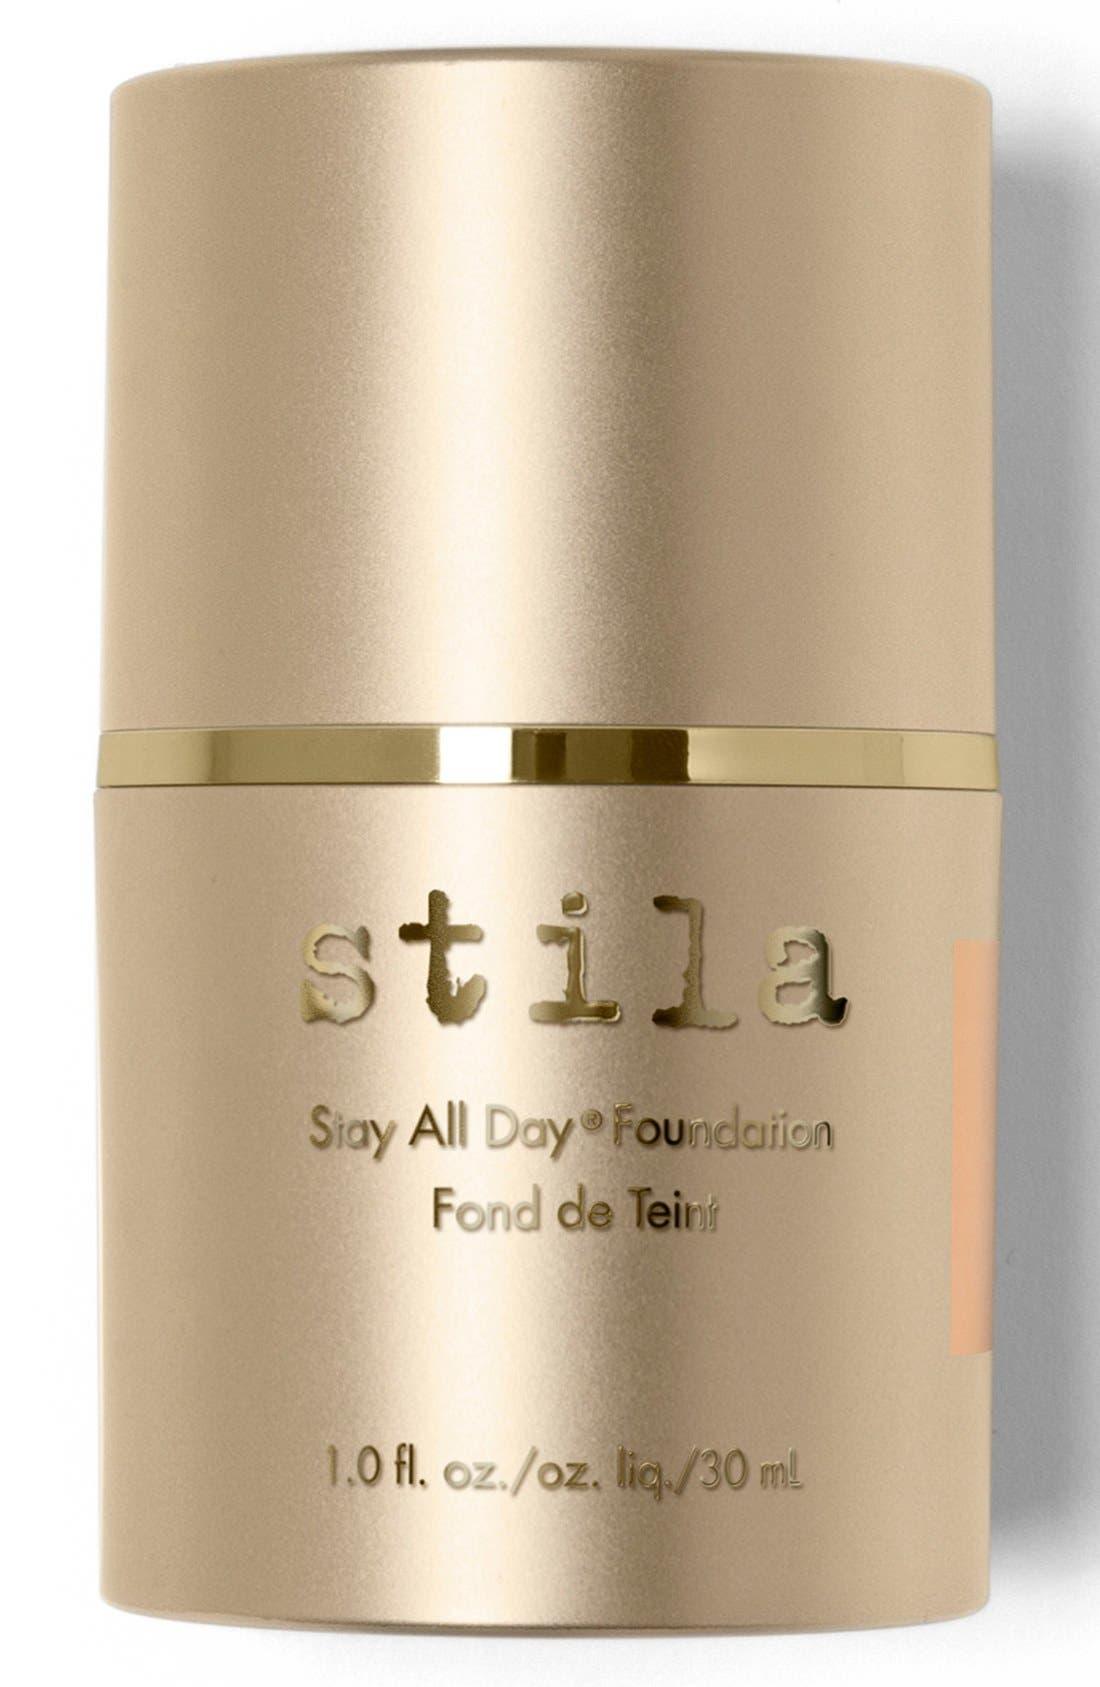 stila 'stay all day' foundation